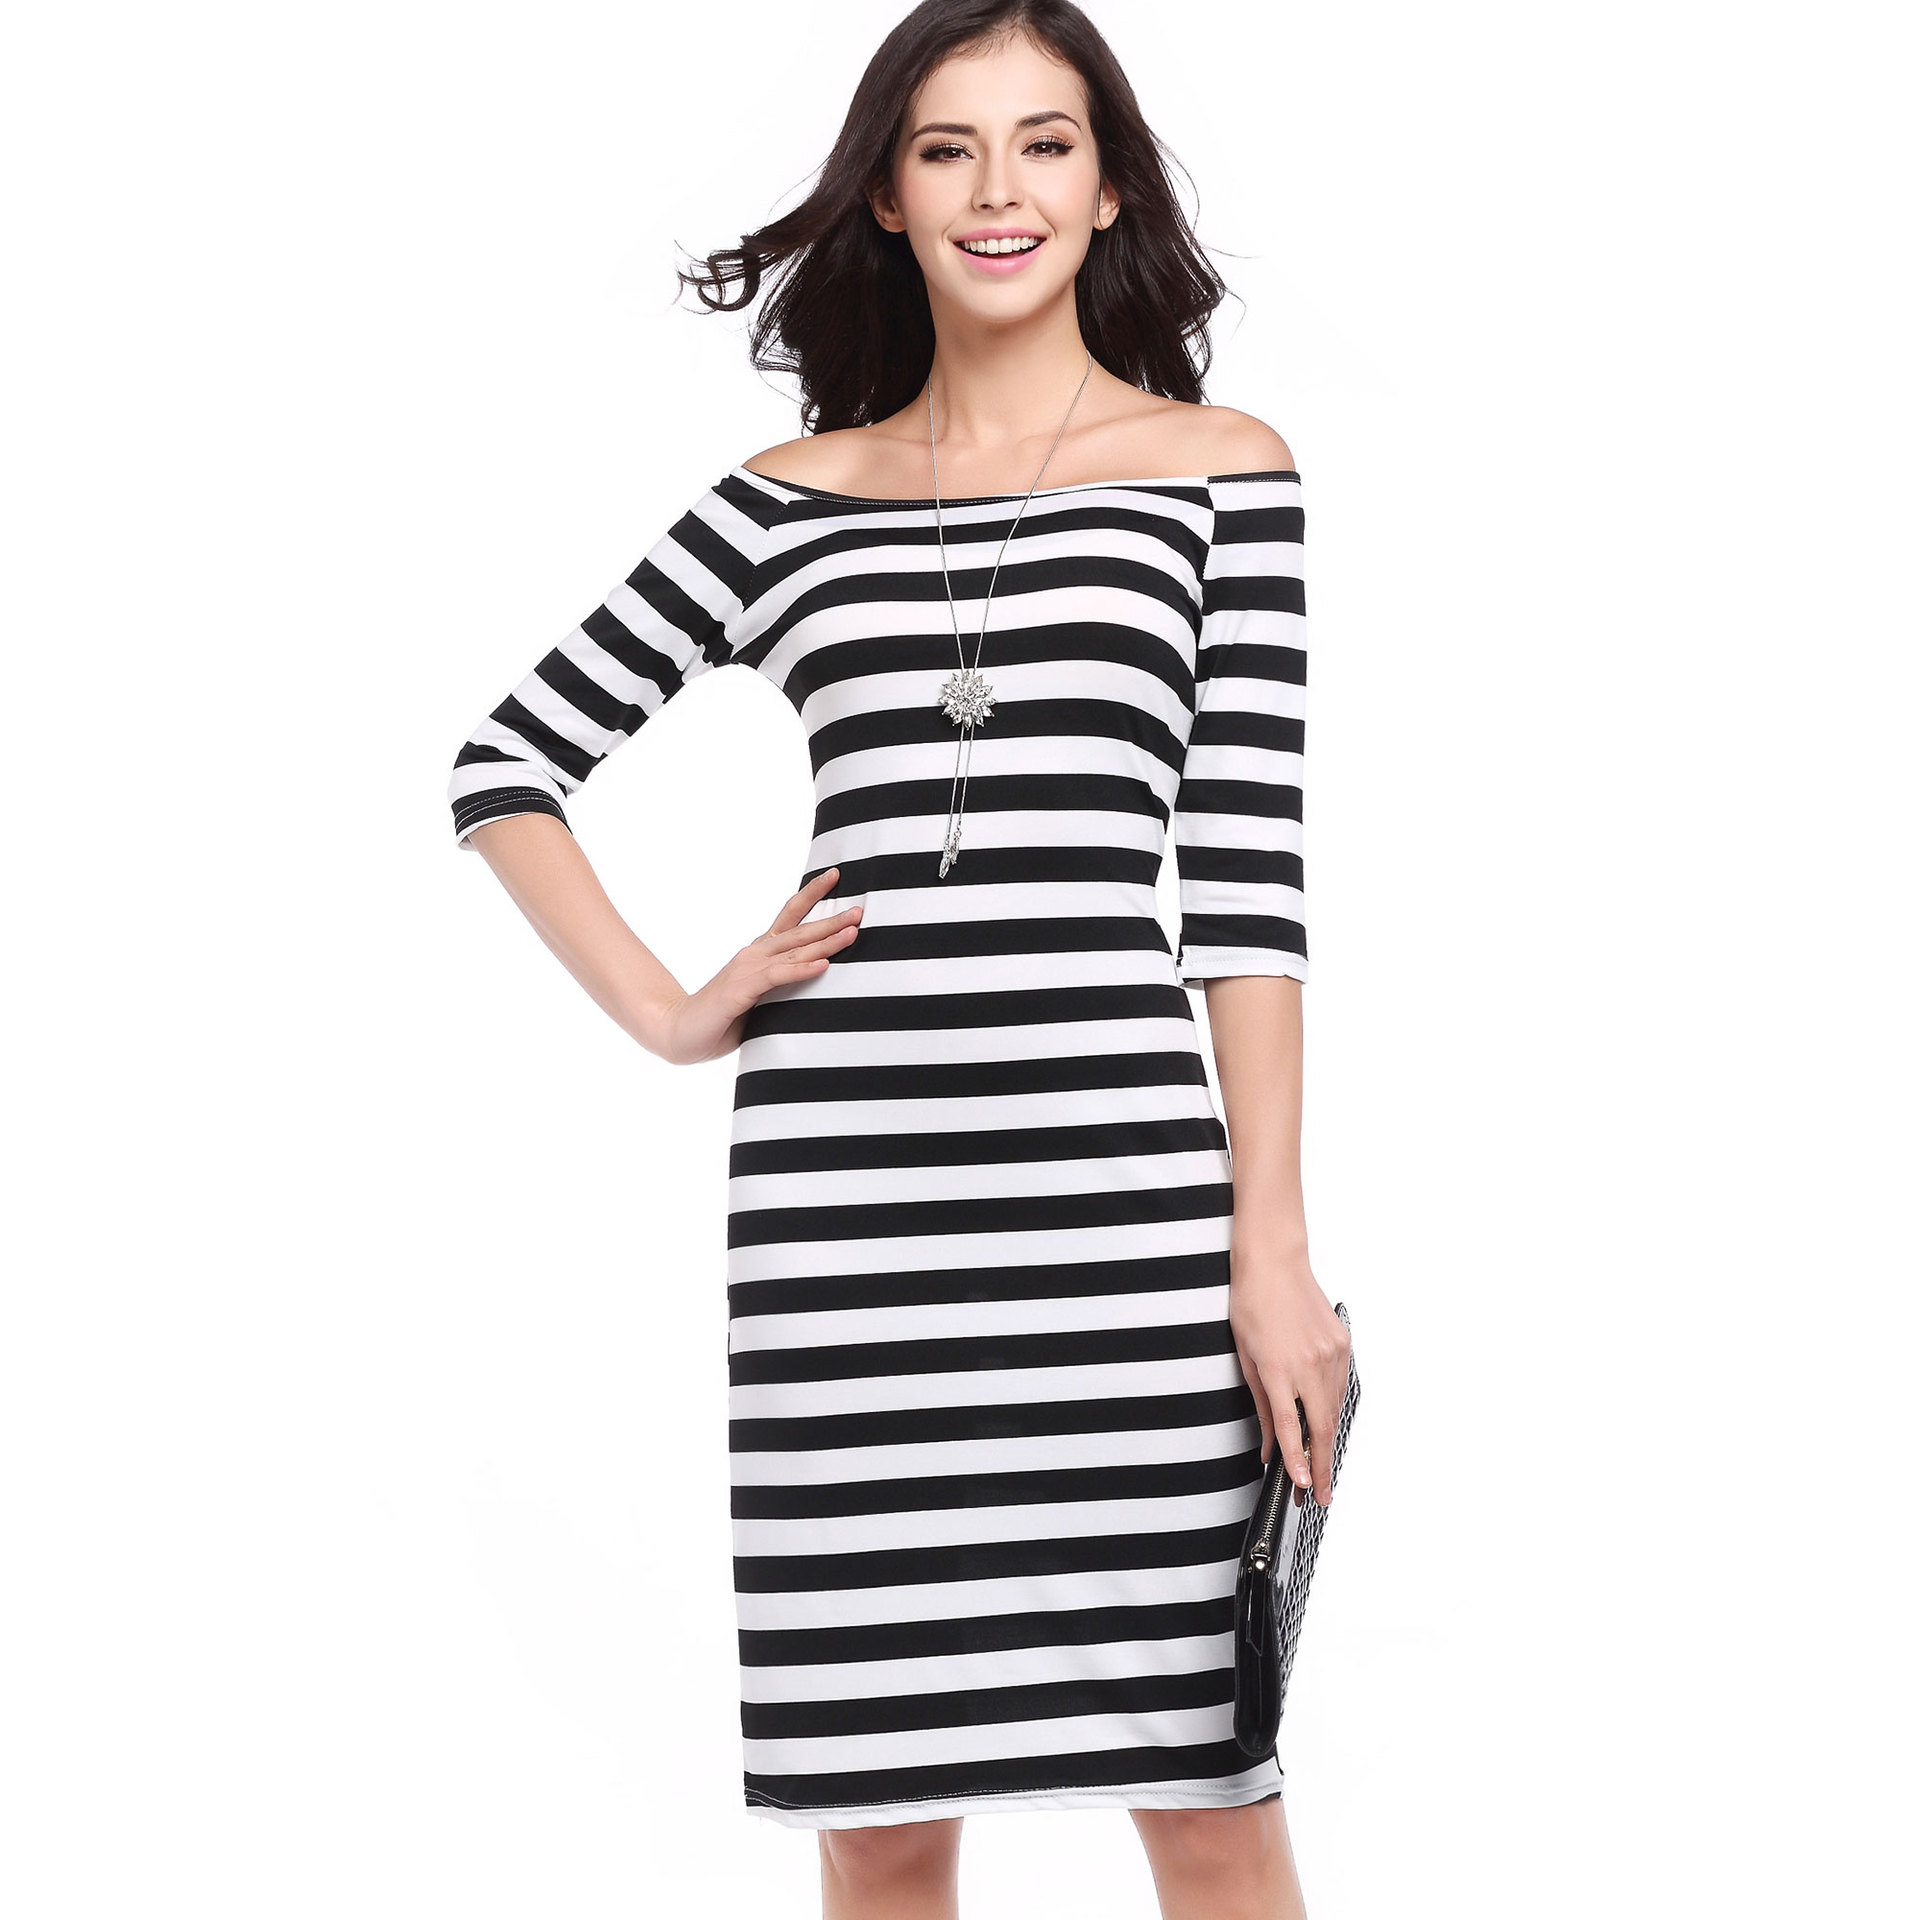 89a0c861df2 Women Striped Dress White Black Summer Casual Sundress Open Back Dress  Sheath Half Sleeve Bodycon Dresses Female Robe Vestidos